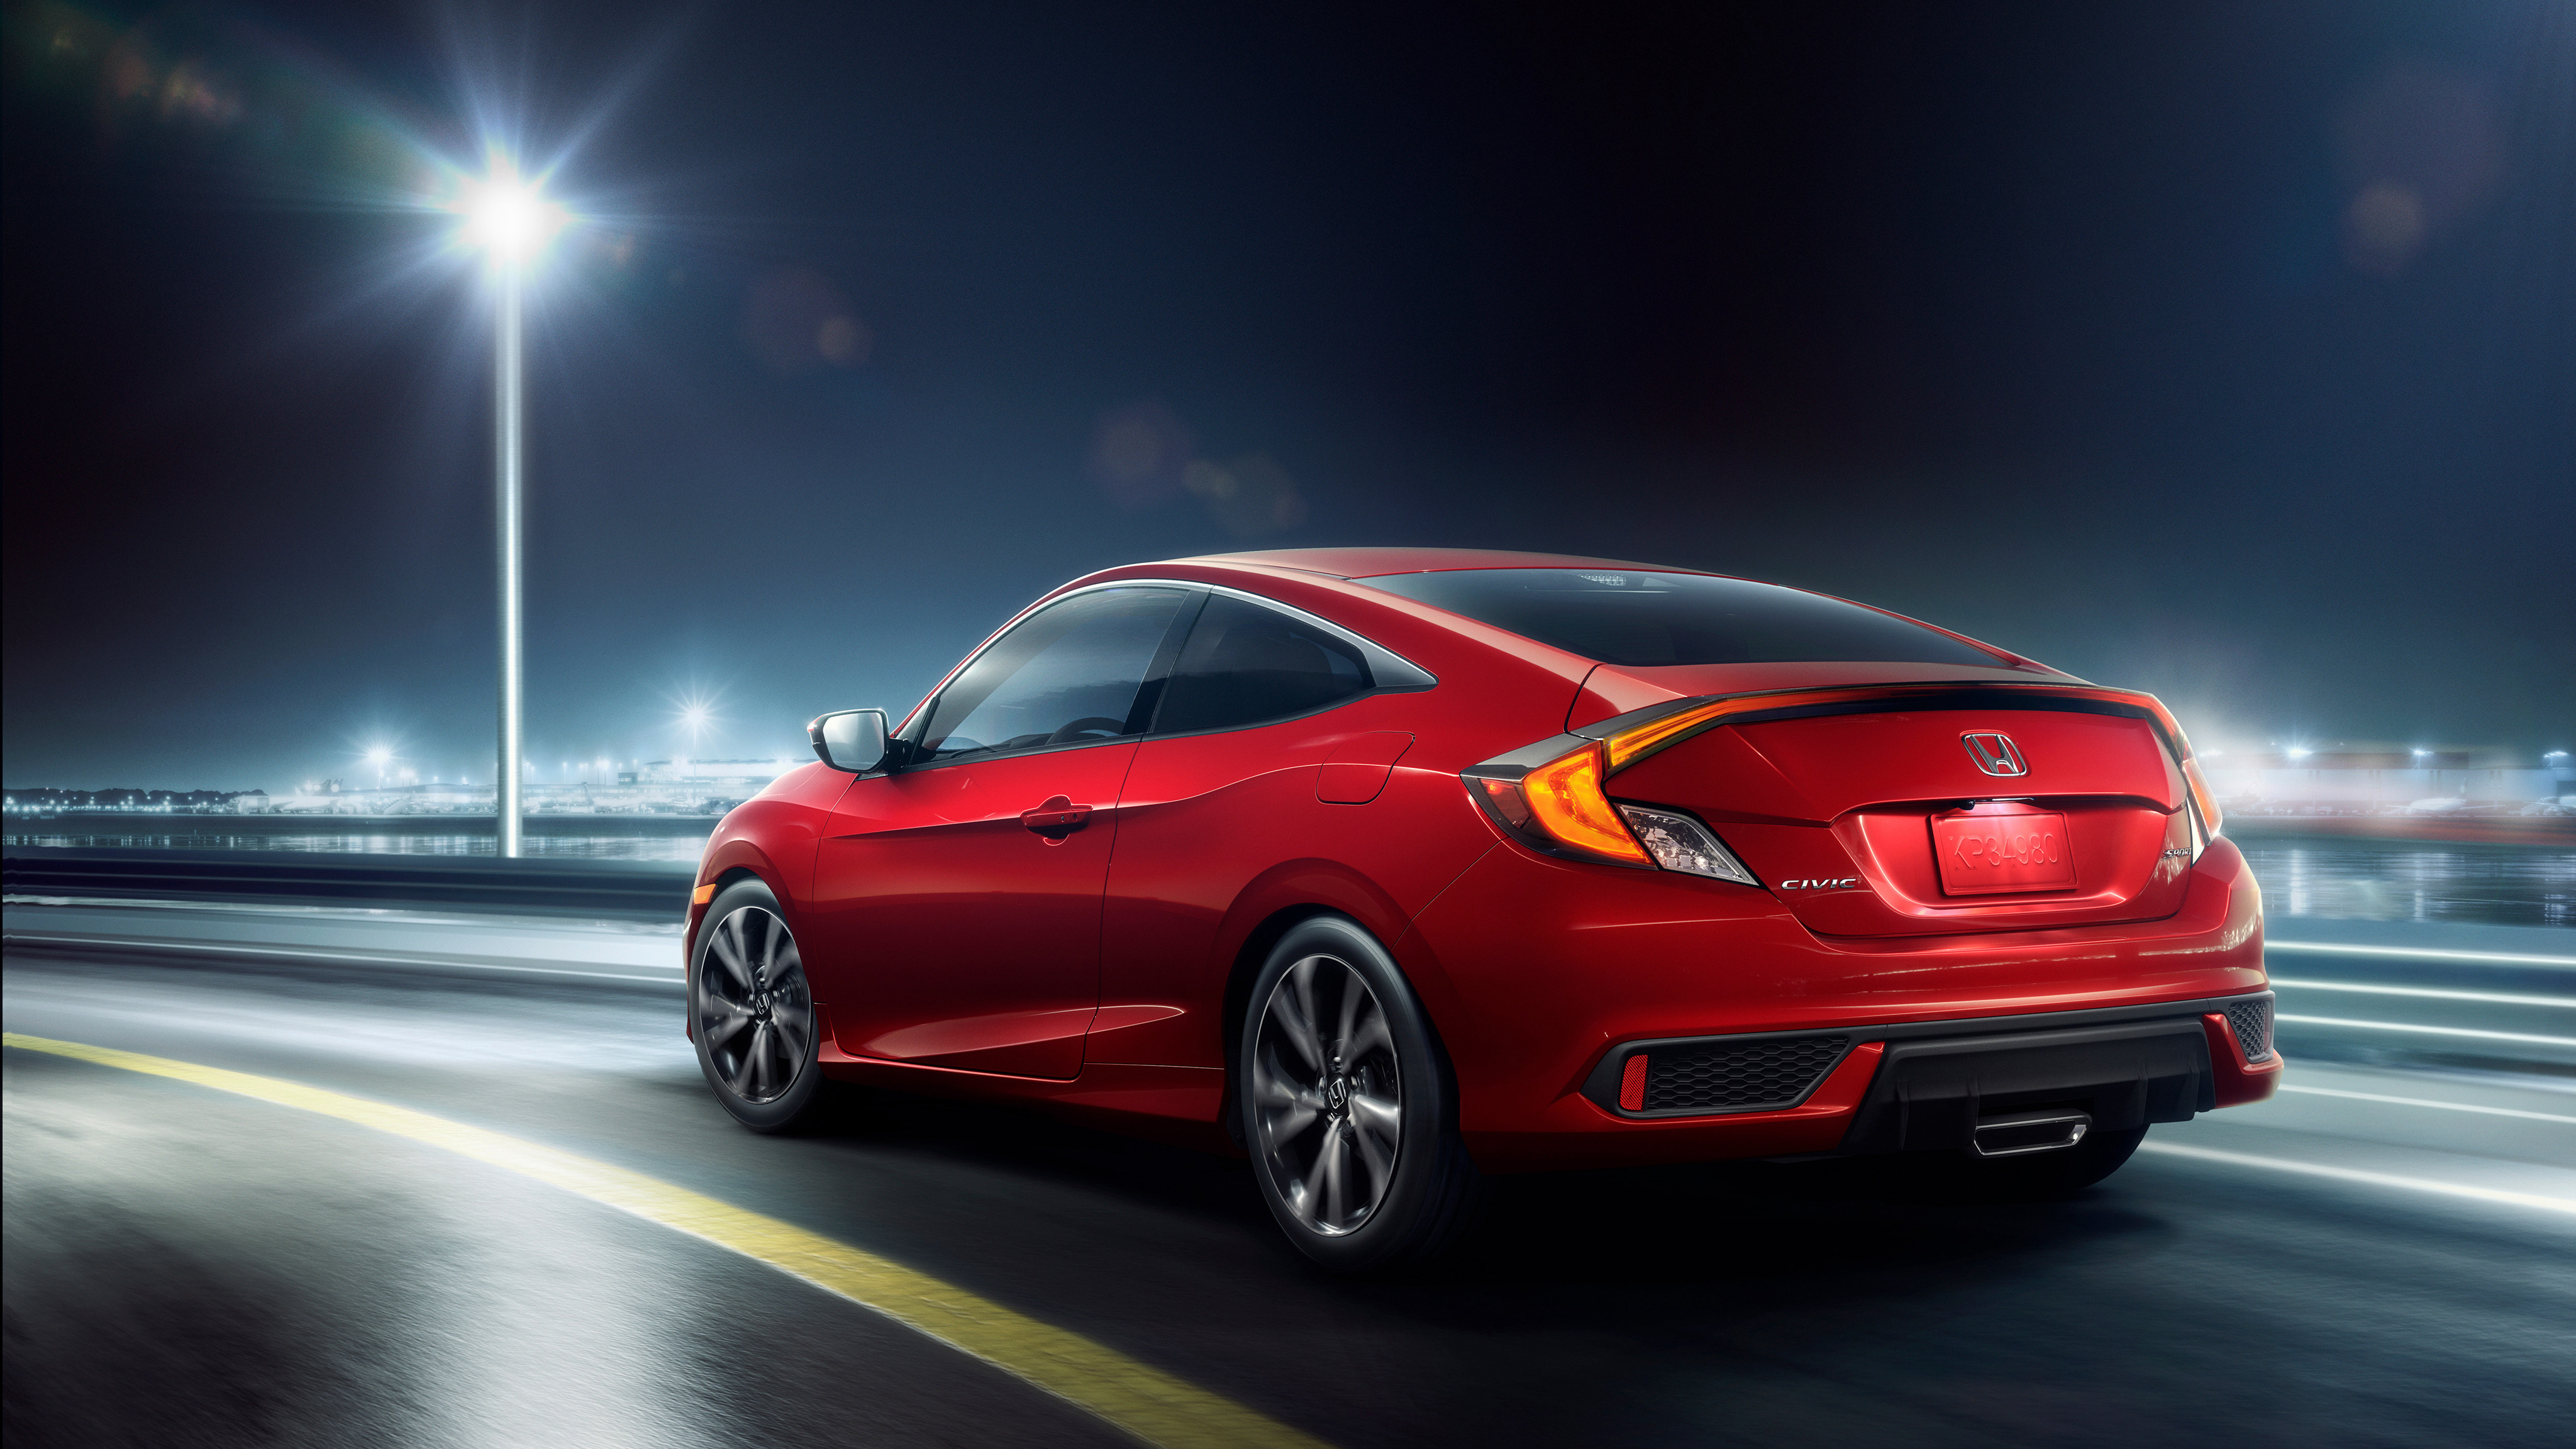 2019 Honda Civic Coupe Sport 4k 2 Wallpaper Hd Car